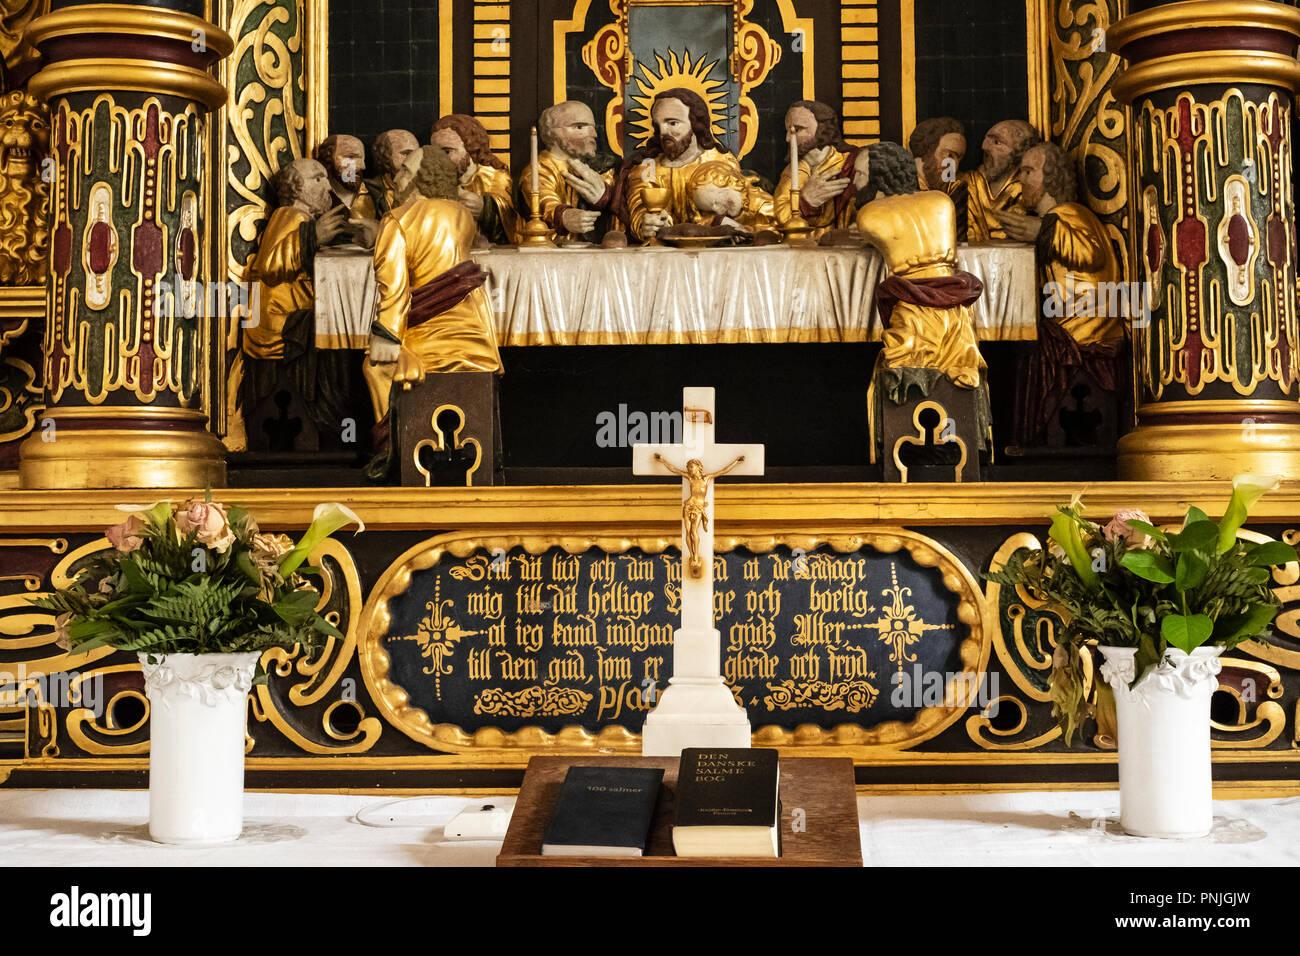 Der Altar der Kirche Elmelunde, Moen Island, Dänemark, Skandinavien, Europa. Der Altar der Kirche von Elmelunde, Insel Mön, Dänemark, Skandinavien, Europ. Stockbild